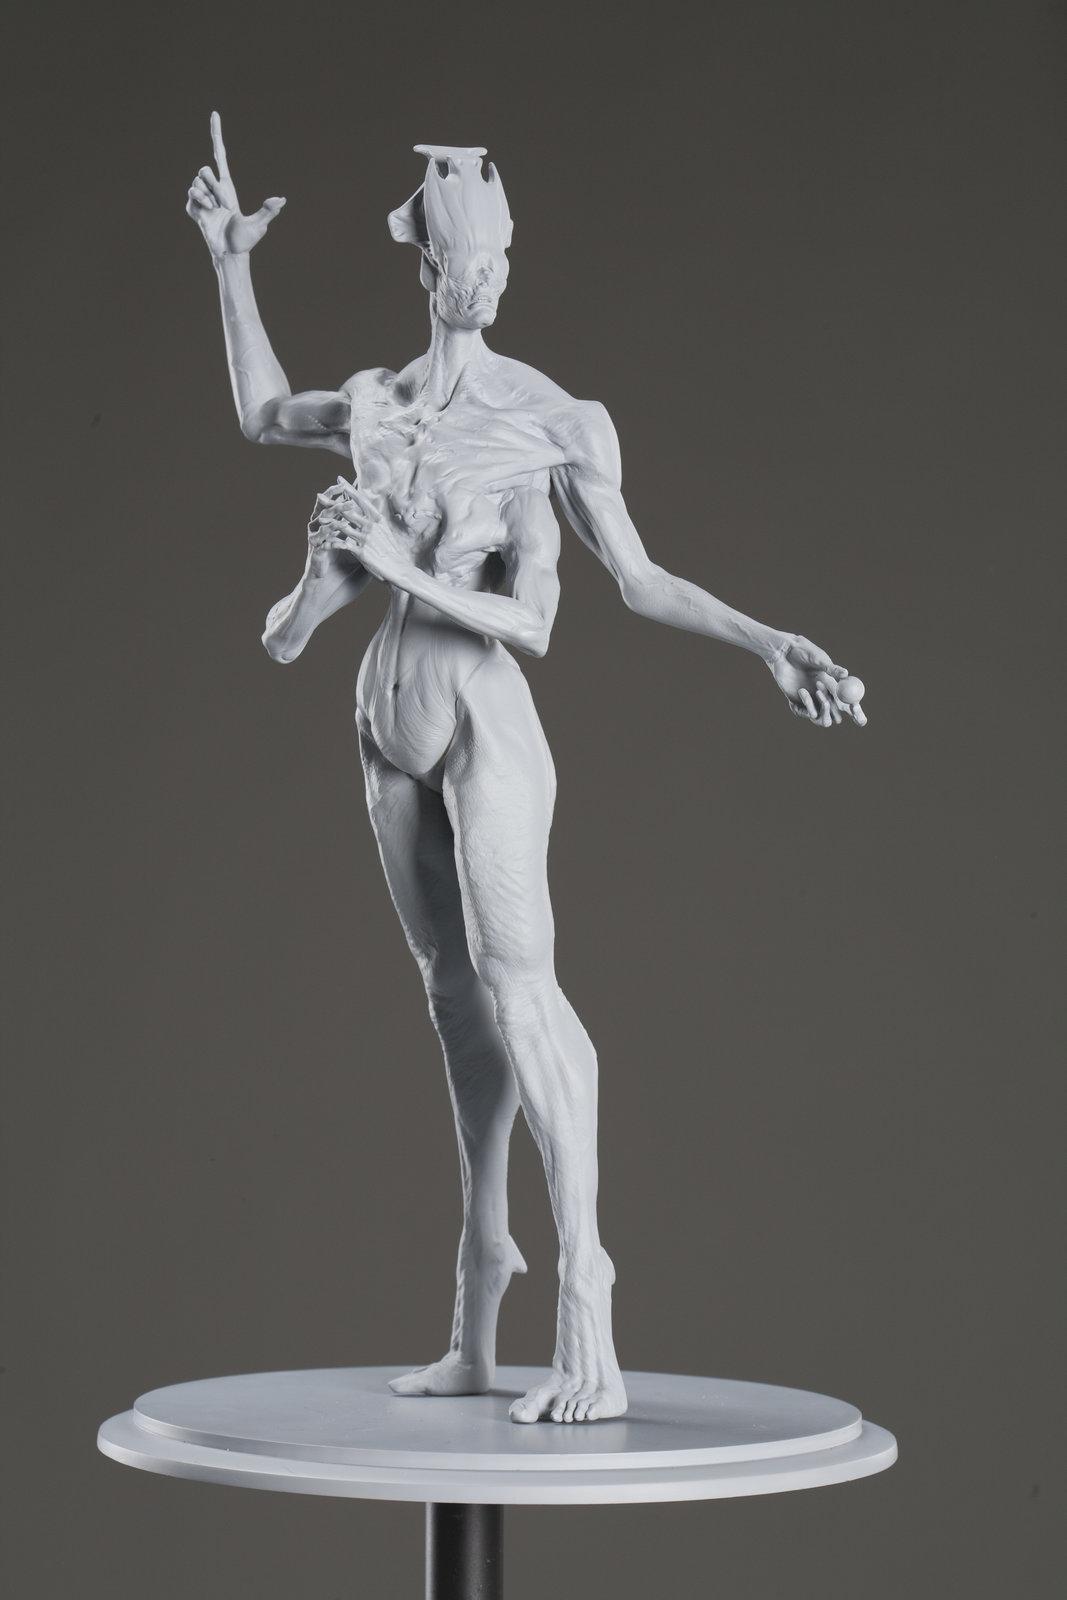 Archon 3D printed maquete